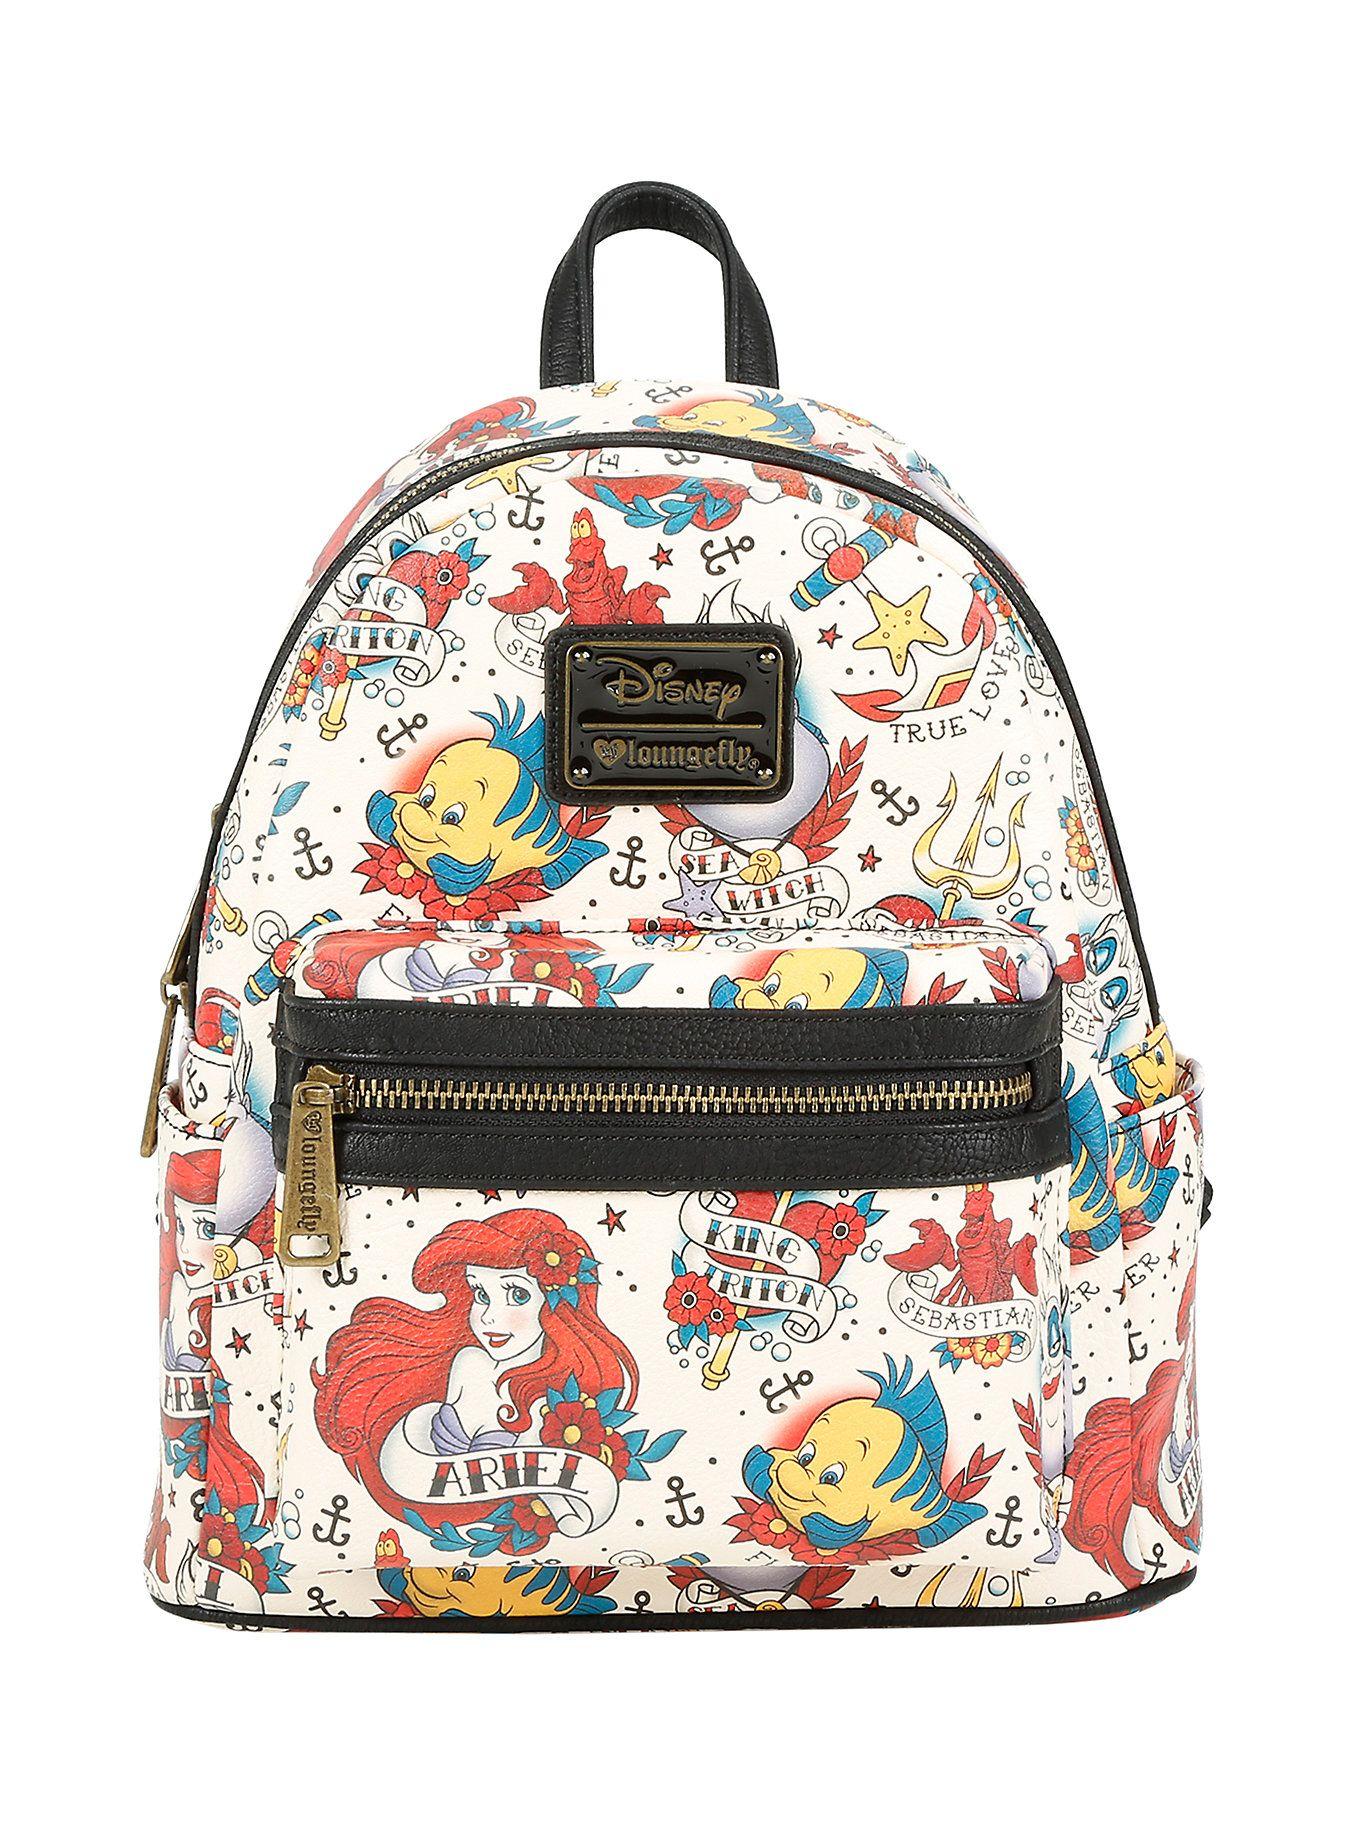 Disney the little mermaid ariel tattoo art mini backpack